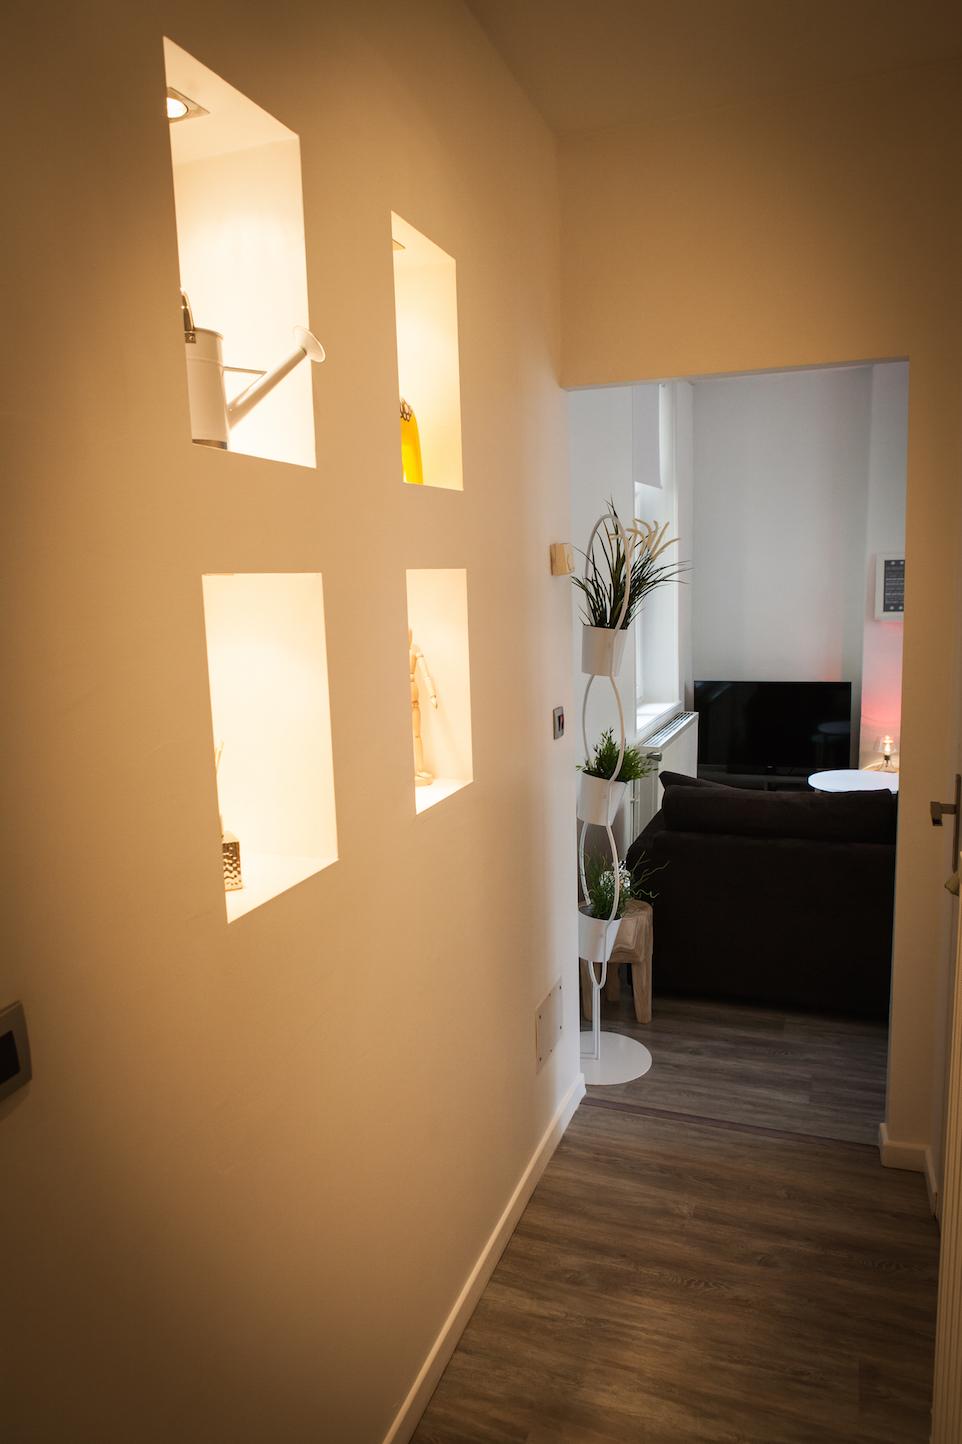 appart hotel metz location meubl e metz chambre d 39 h te. Black Bedroom Furniture Sets. Home Design Ideas